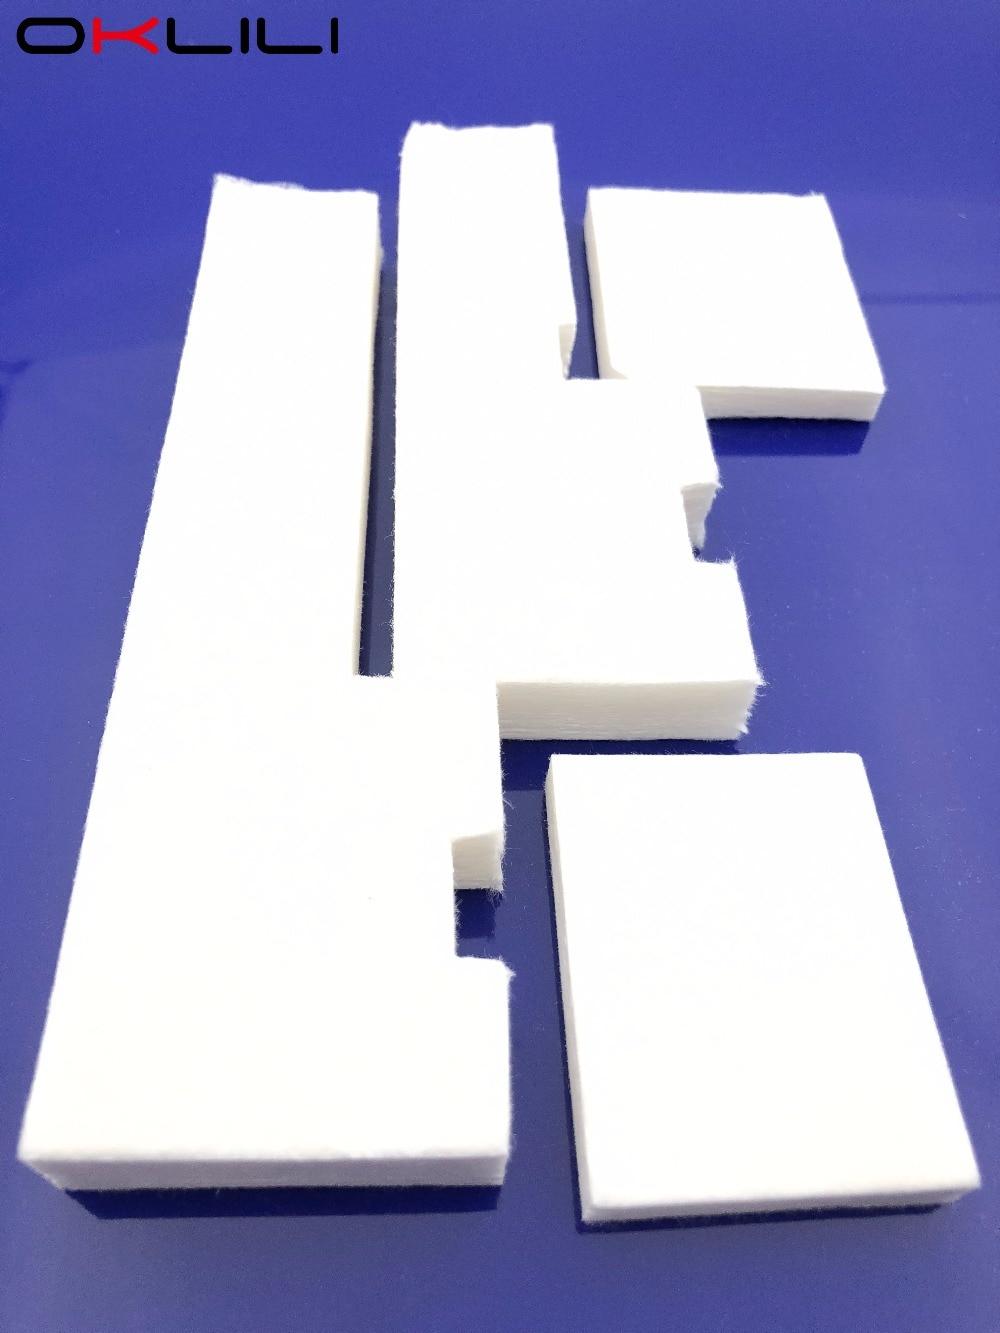 1SET X Waste Ink Tank Pad Sponge For Epson L300 L301 L303 L310 L350 L351 L353 L358 L355 L111 L110 L210 L211 ME101 ME303 ME401